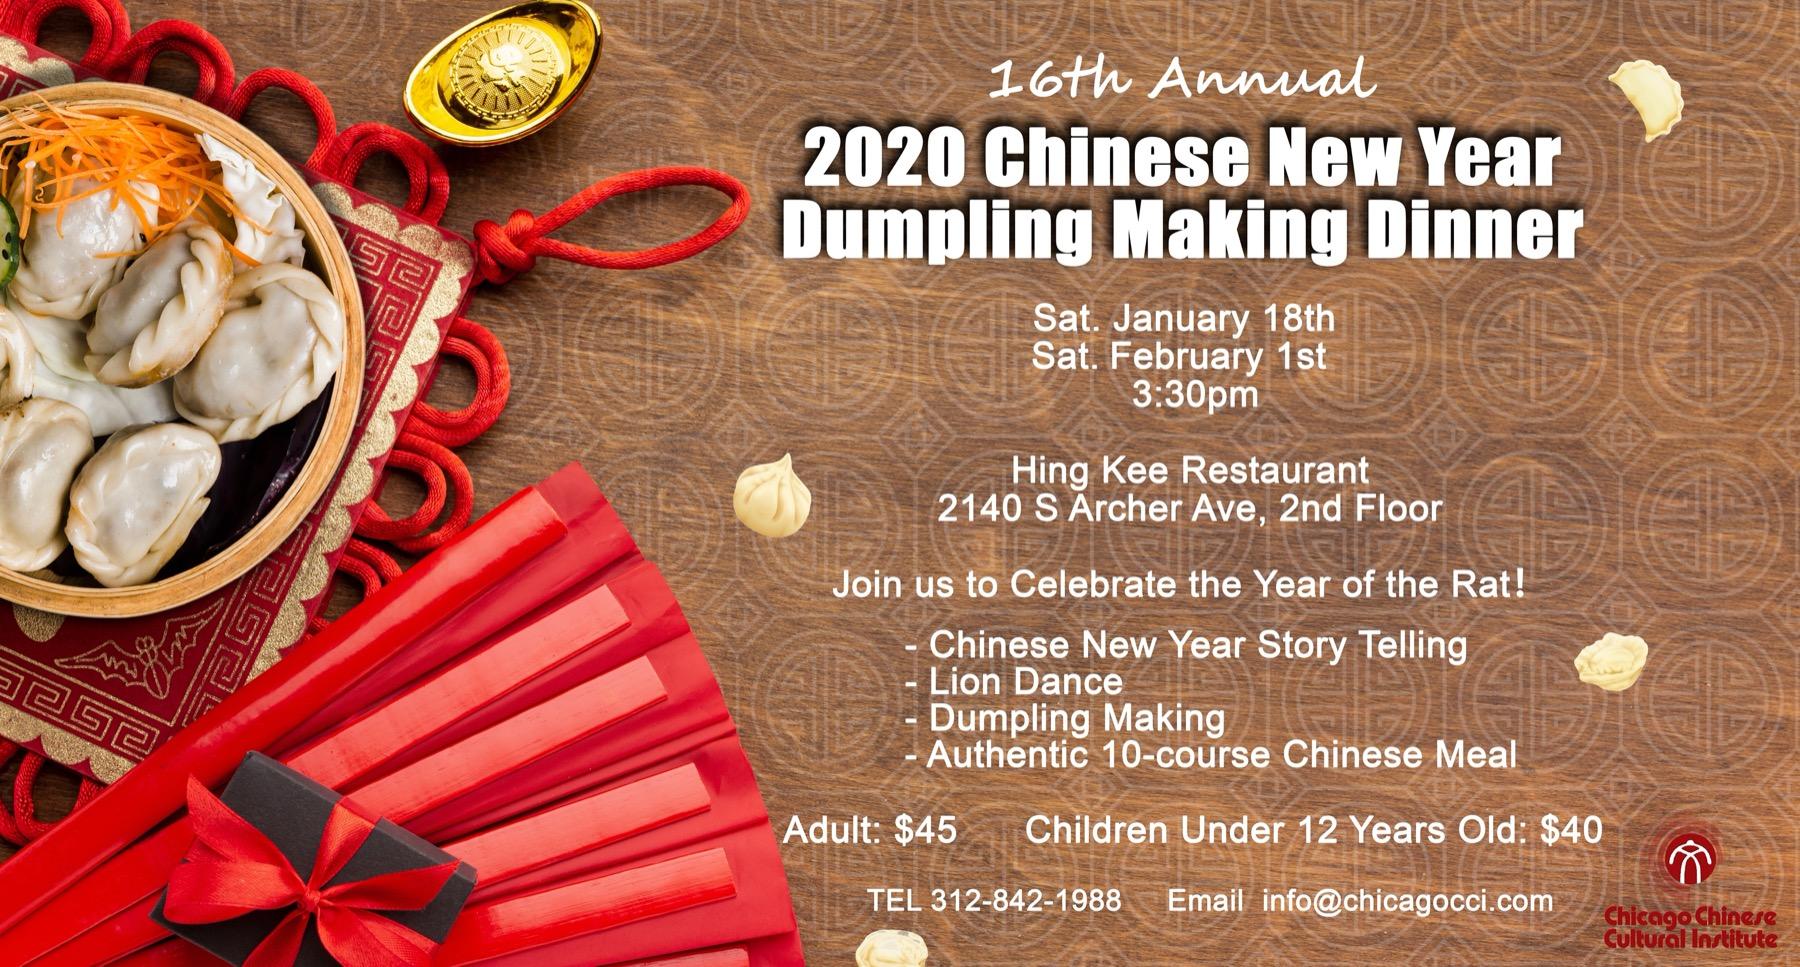 2020 Chinese New Year Dumpling Making Dinner